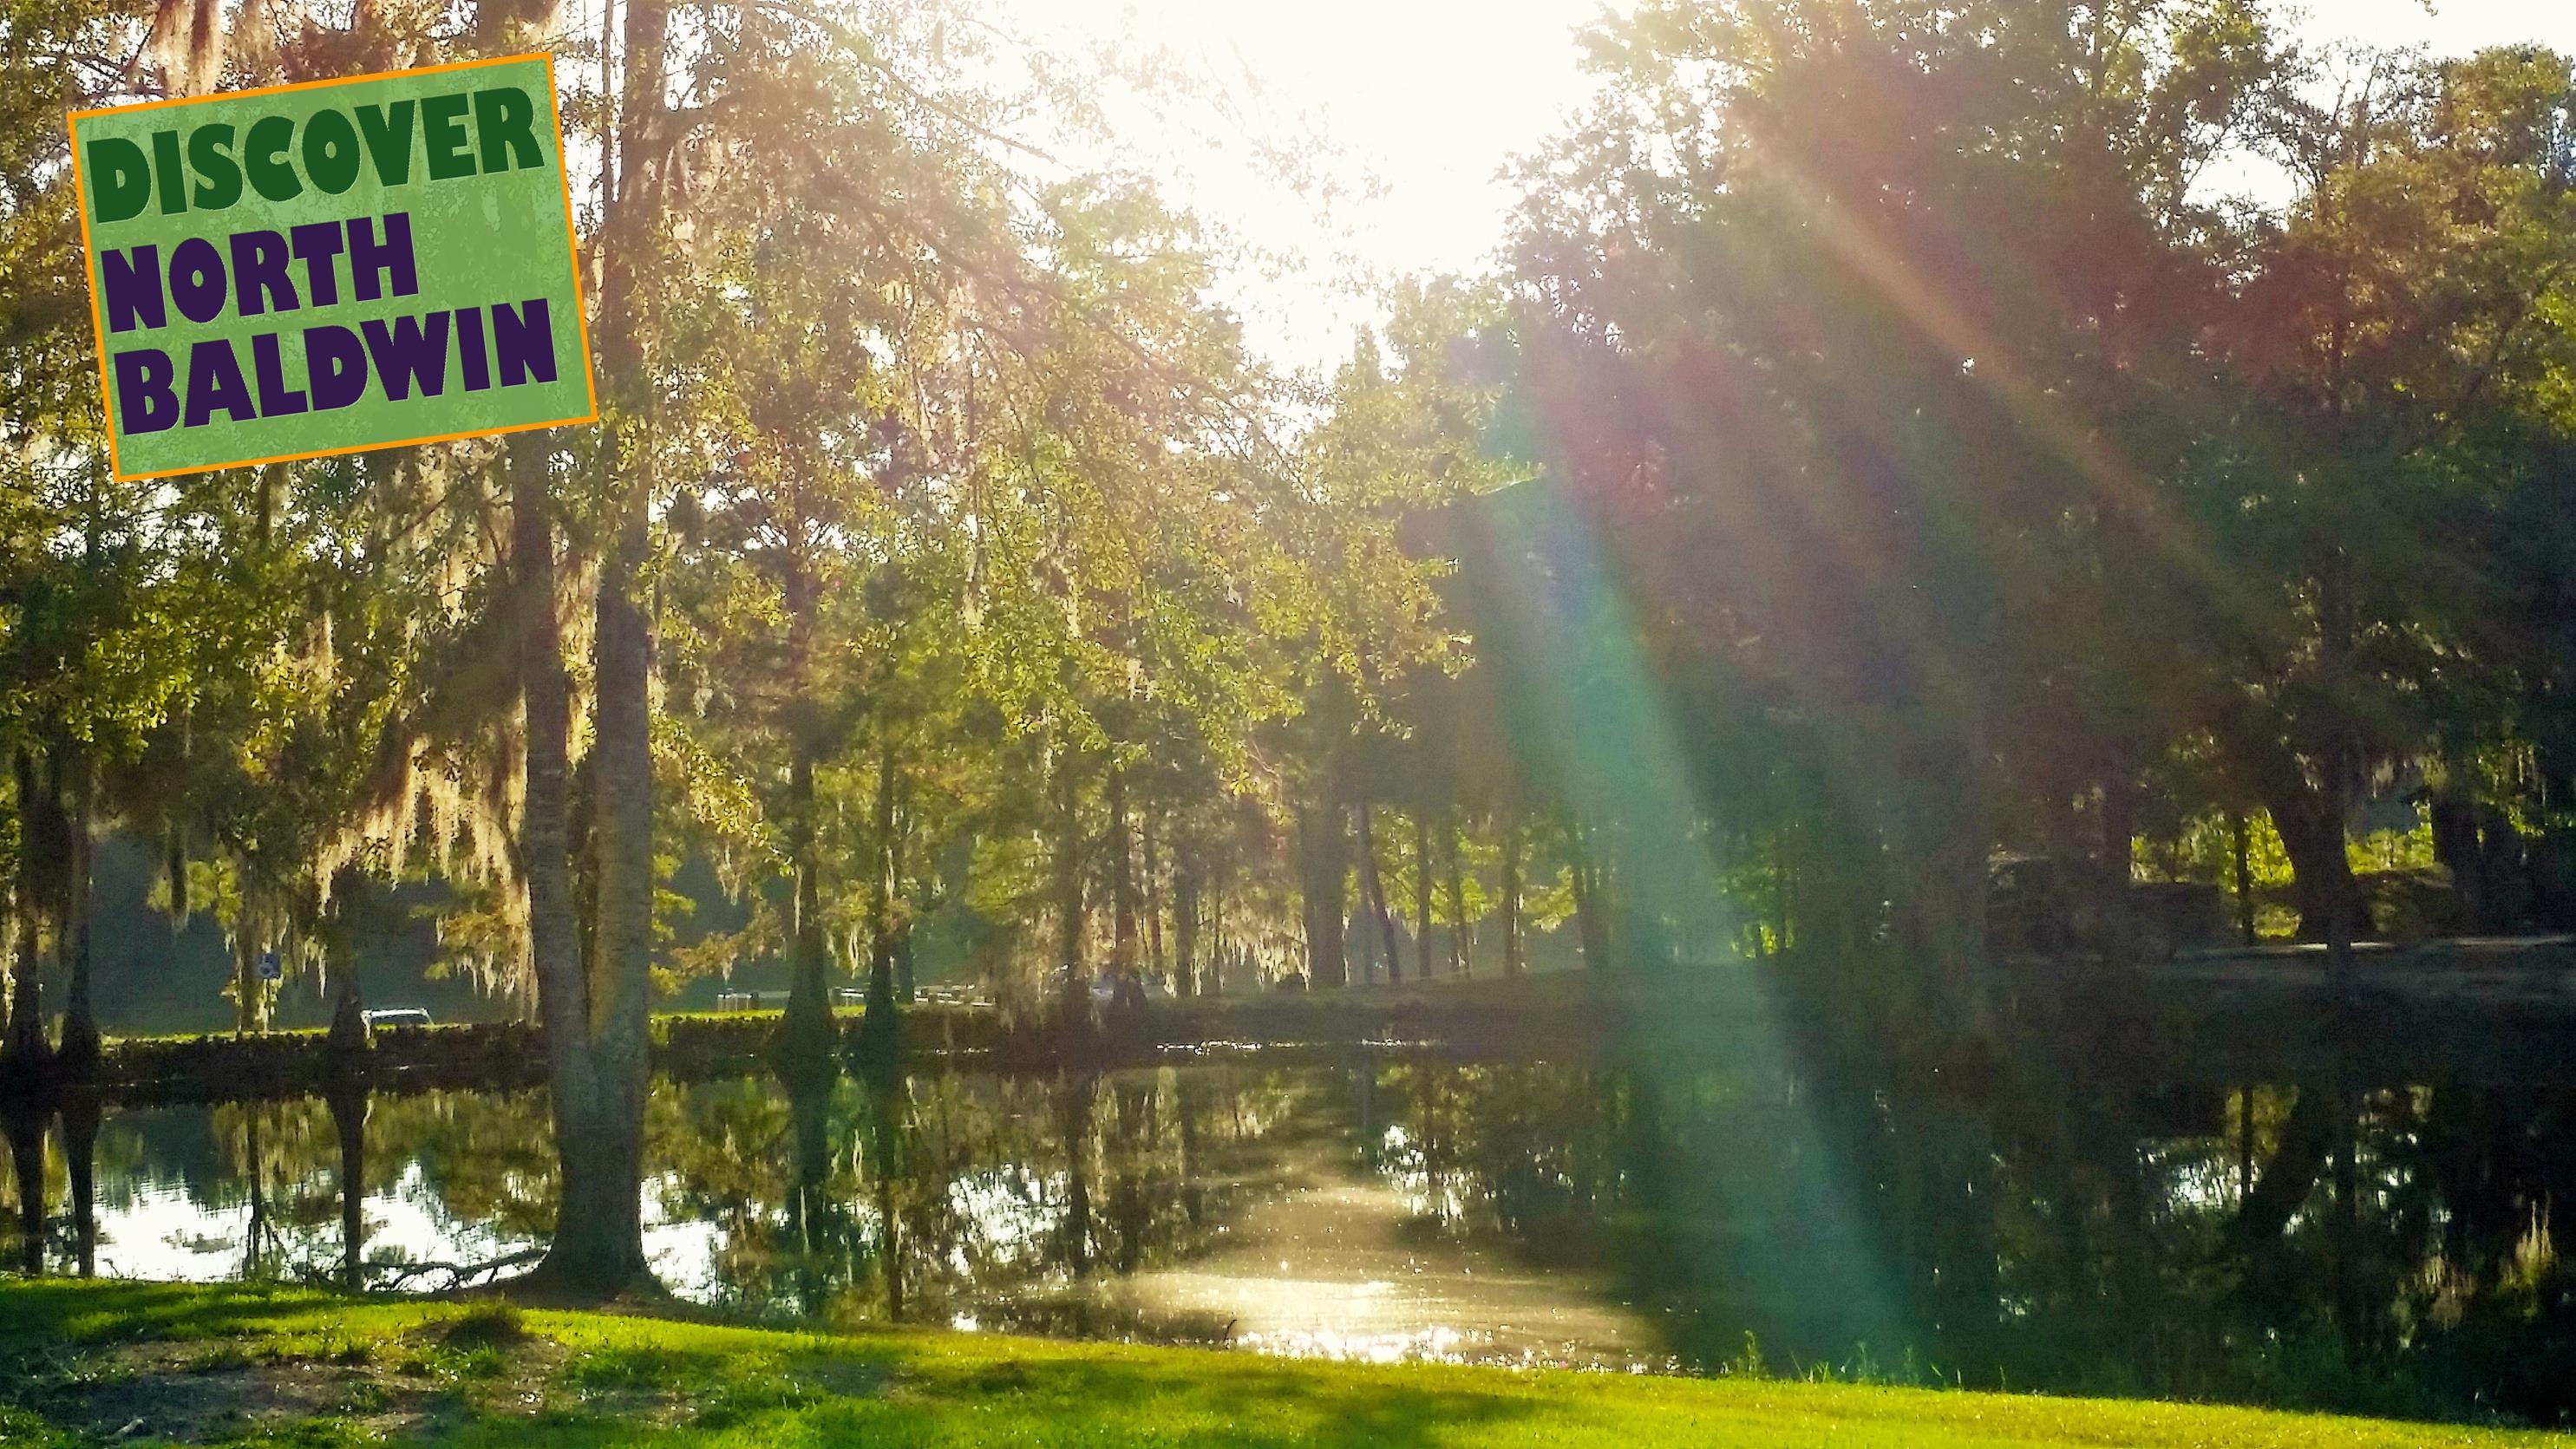 https://alabama-travel.s3.amazonaws.com/partners-uploads/photo/image/552549cec41d91029d000028/live_oak_pond.jpg